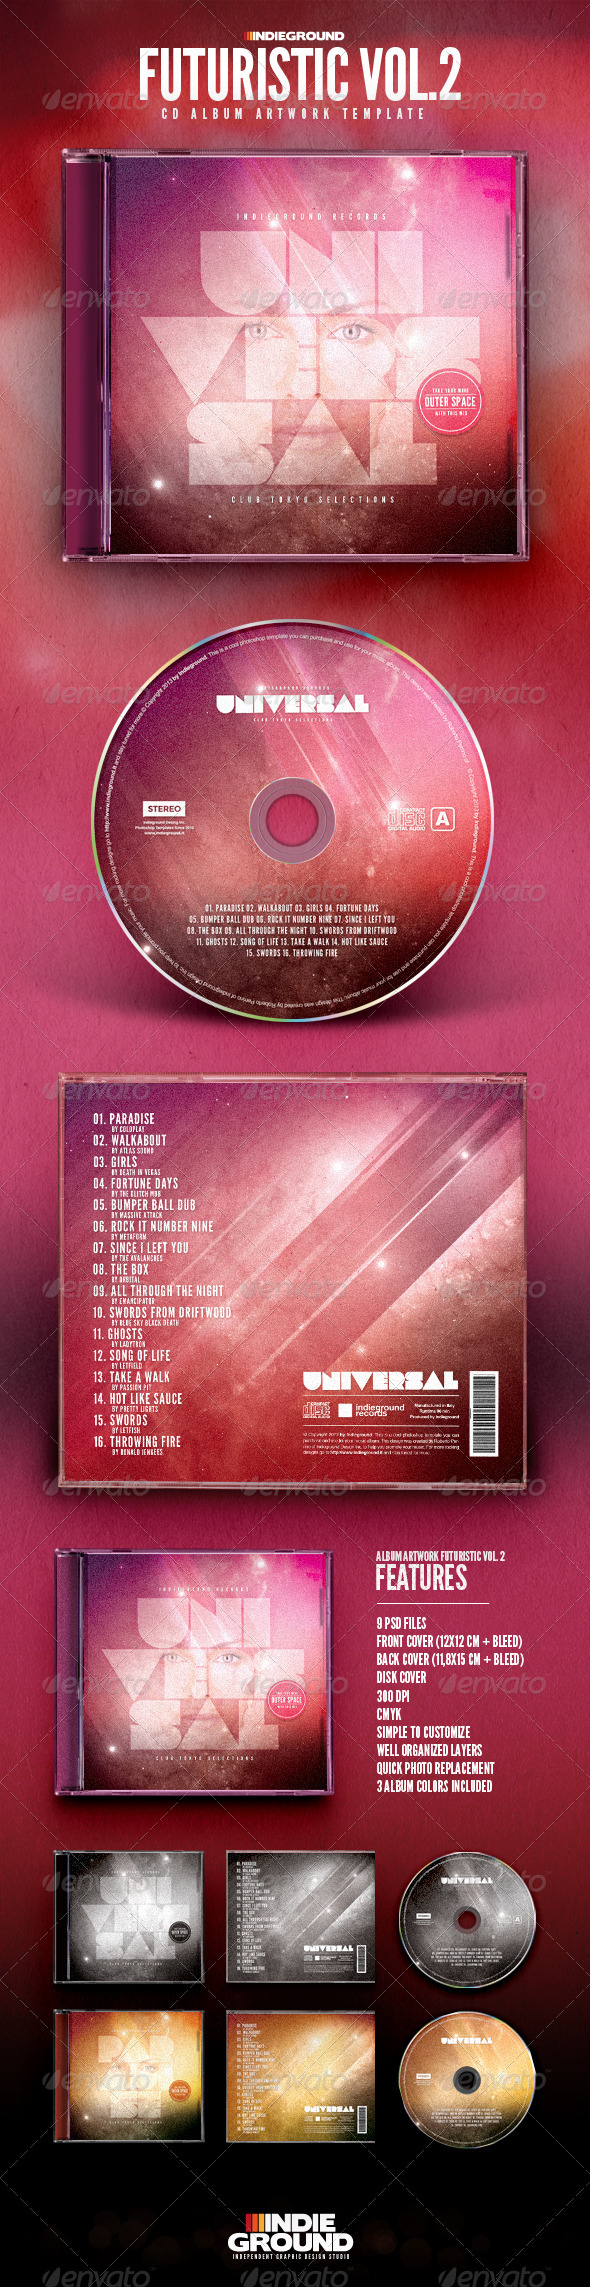 GraphicRiver Futuristic CD Album Artwork Vol 2 7029700